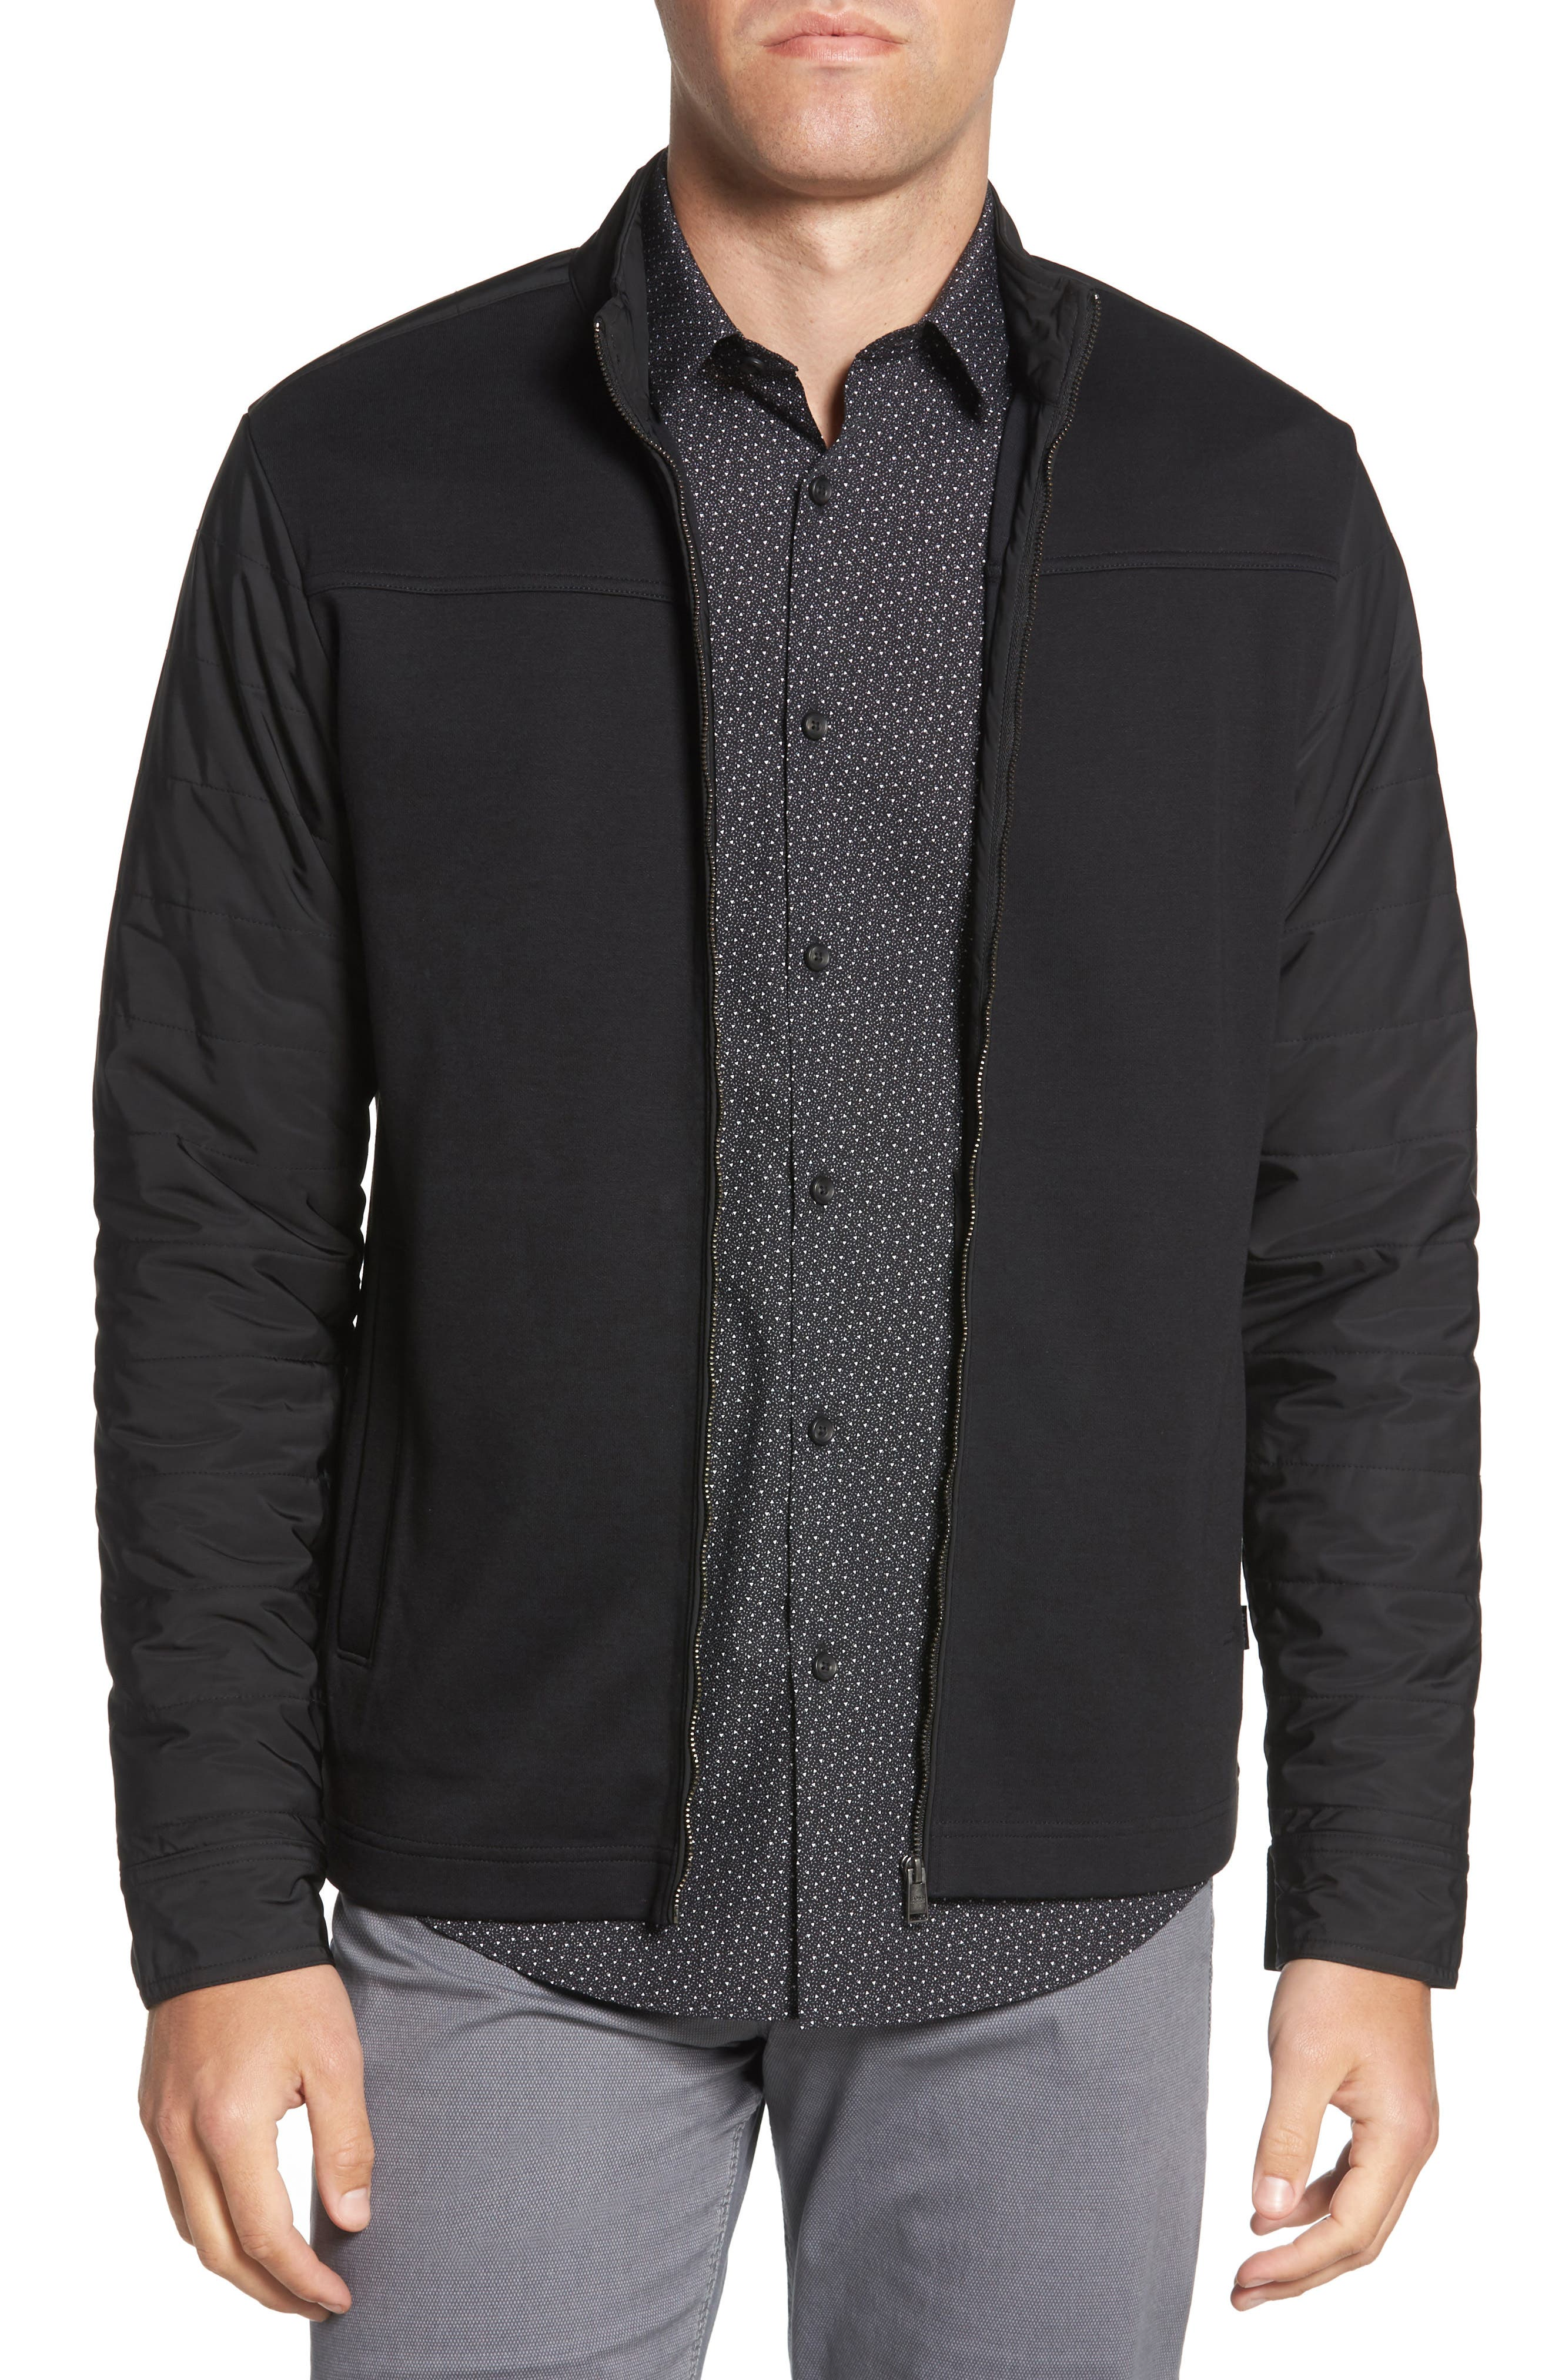 Soule Slim Fit Moto Jacket,                             Main thumbnail 1, color,                             BLACK